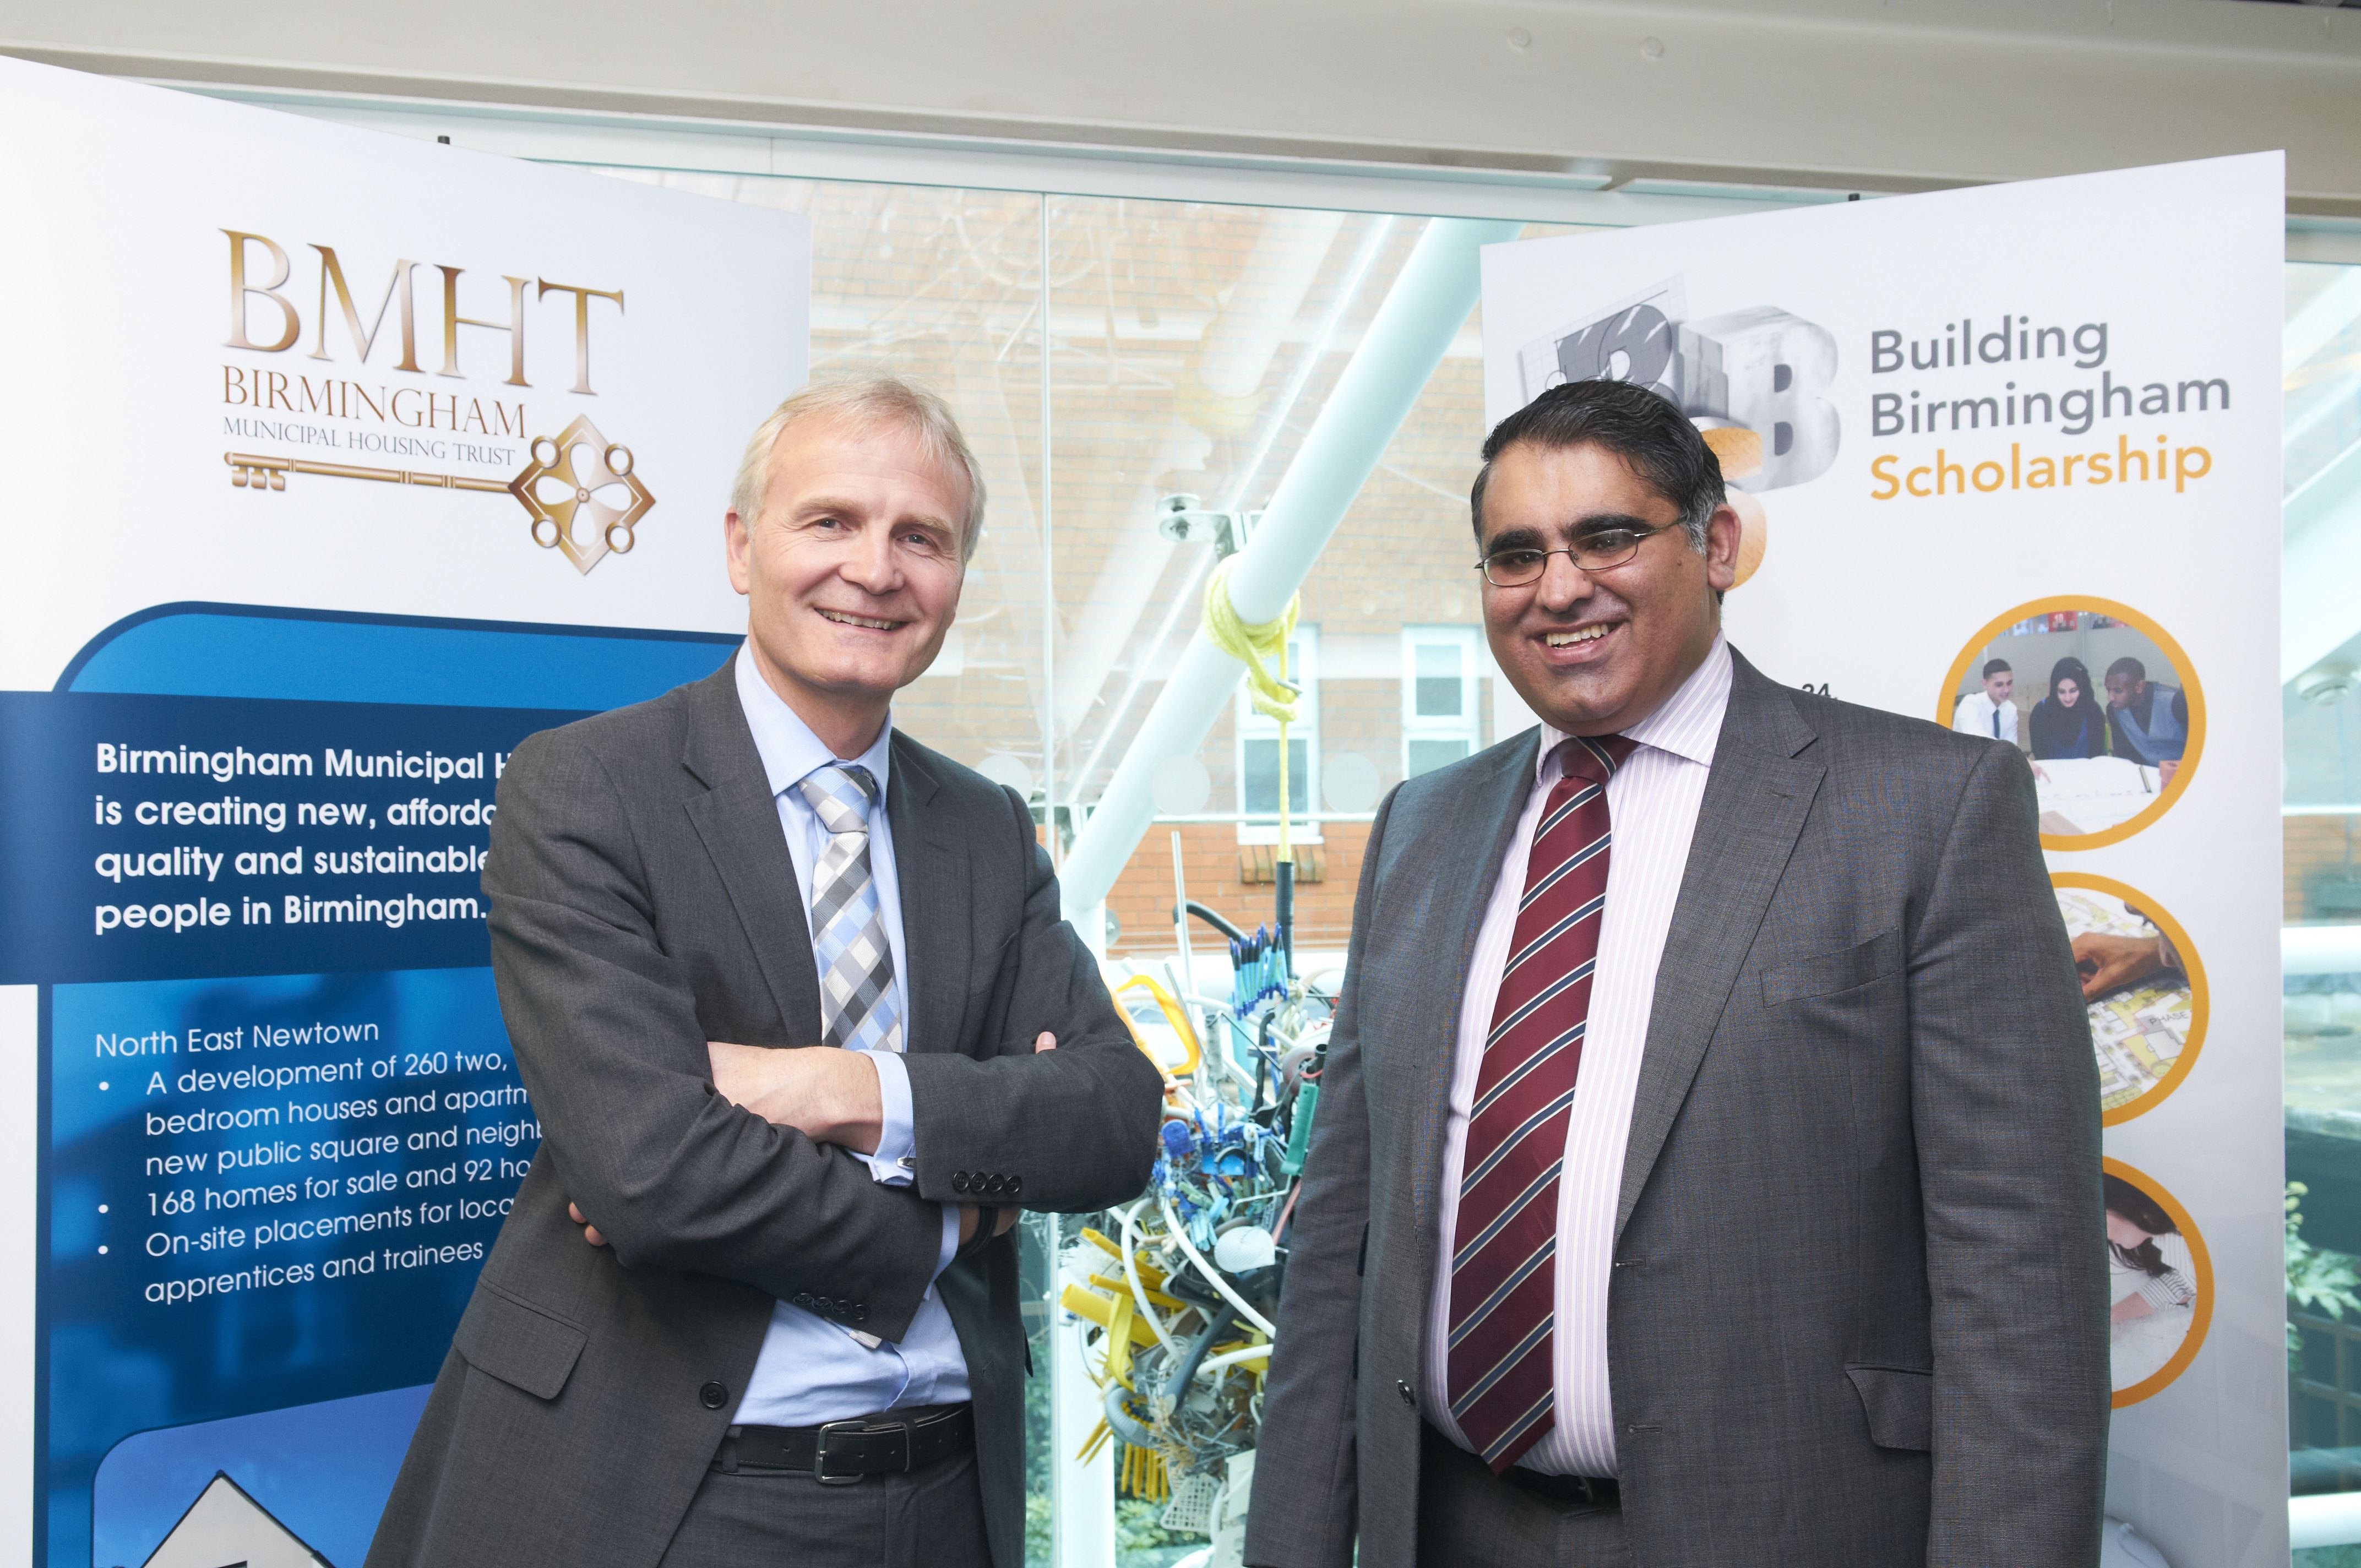 Clive Jessup meets Cllr Tahir Ali